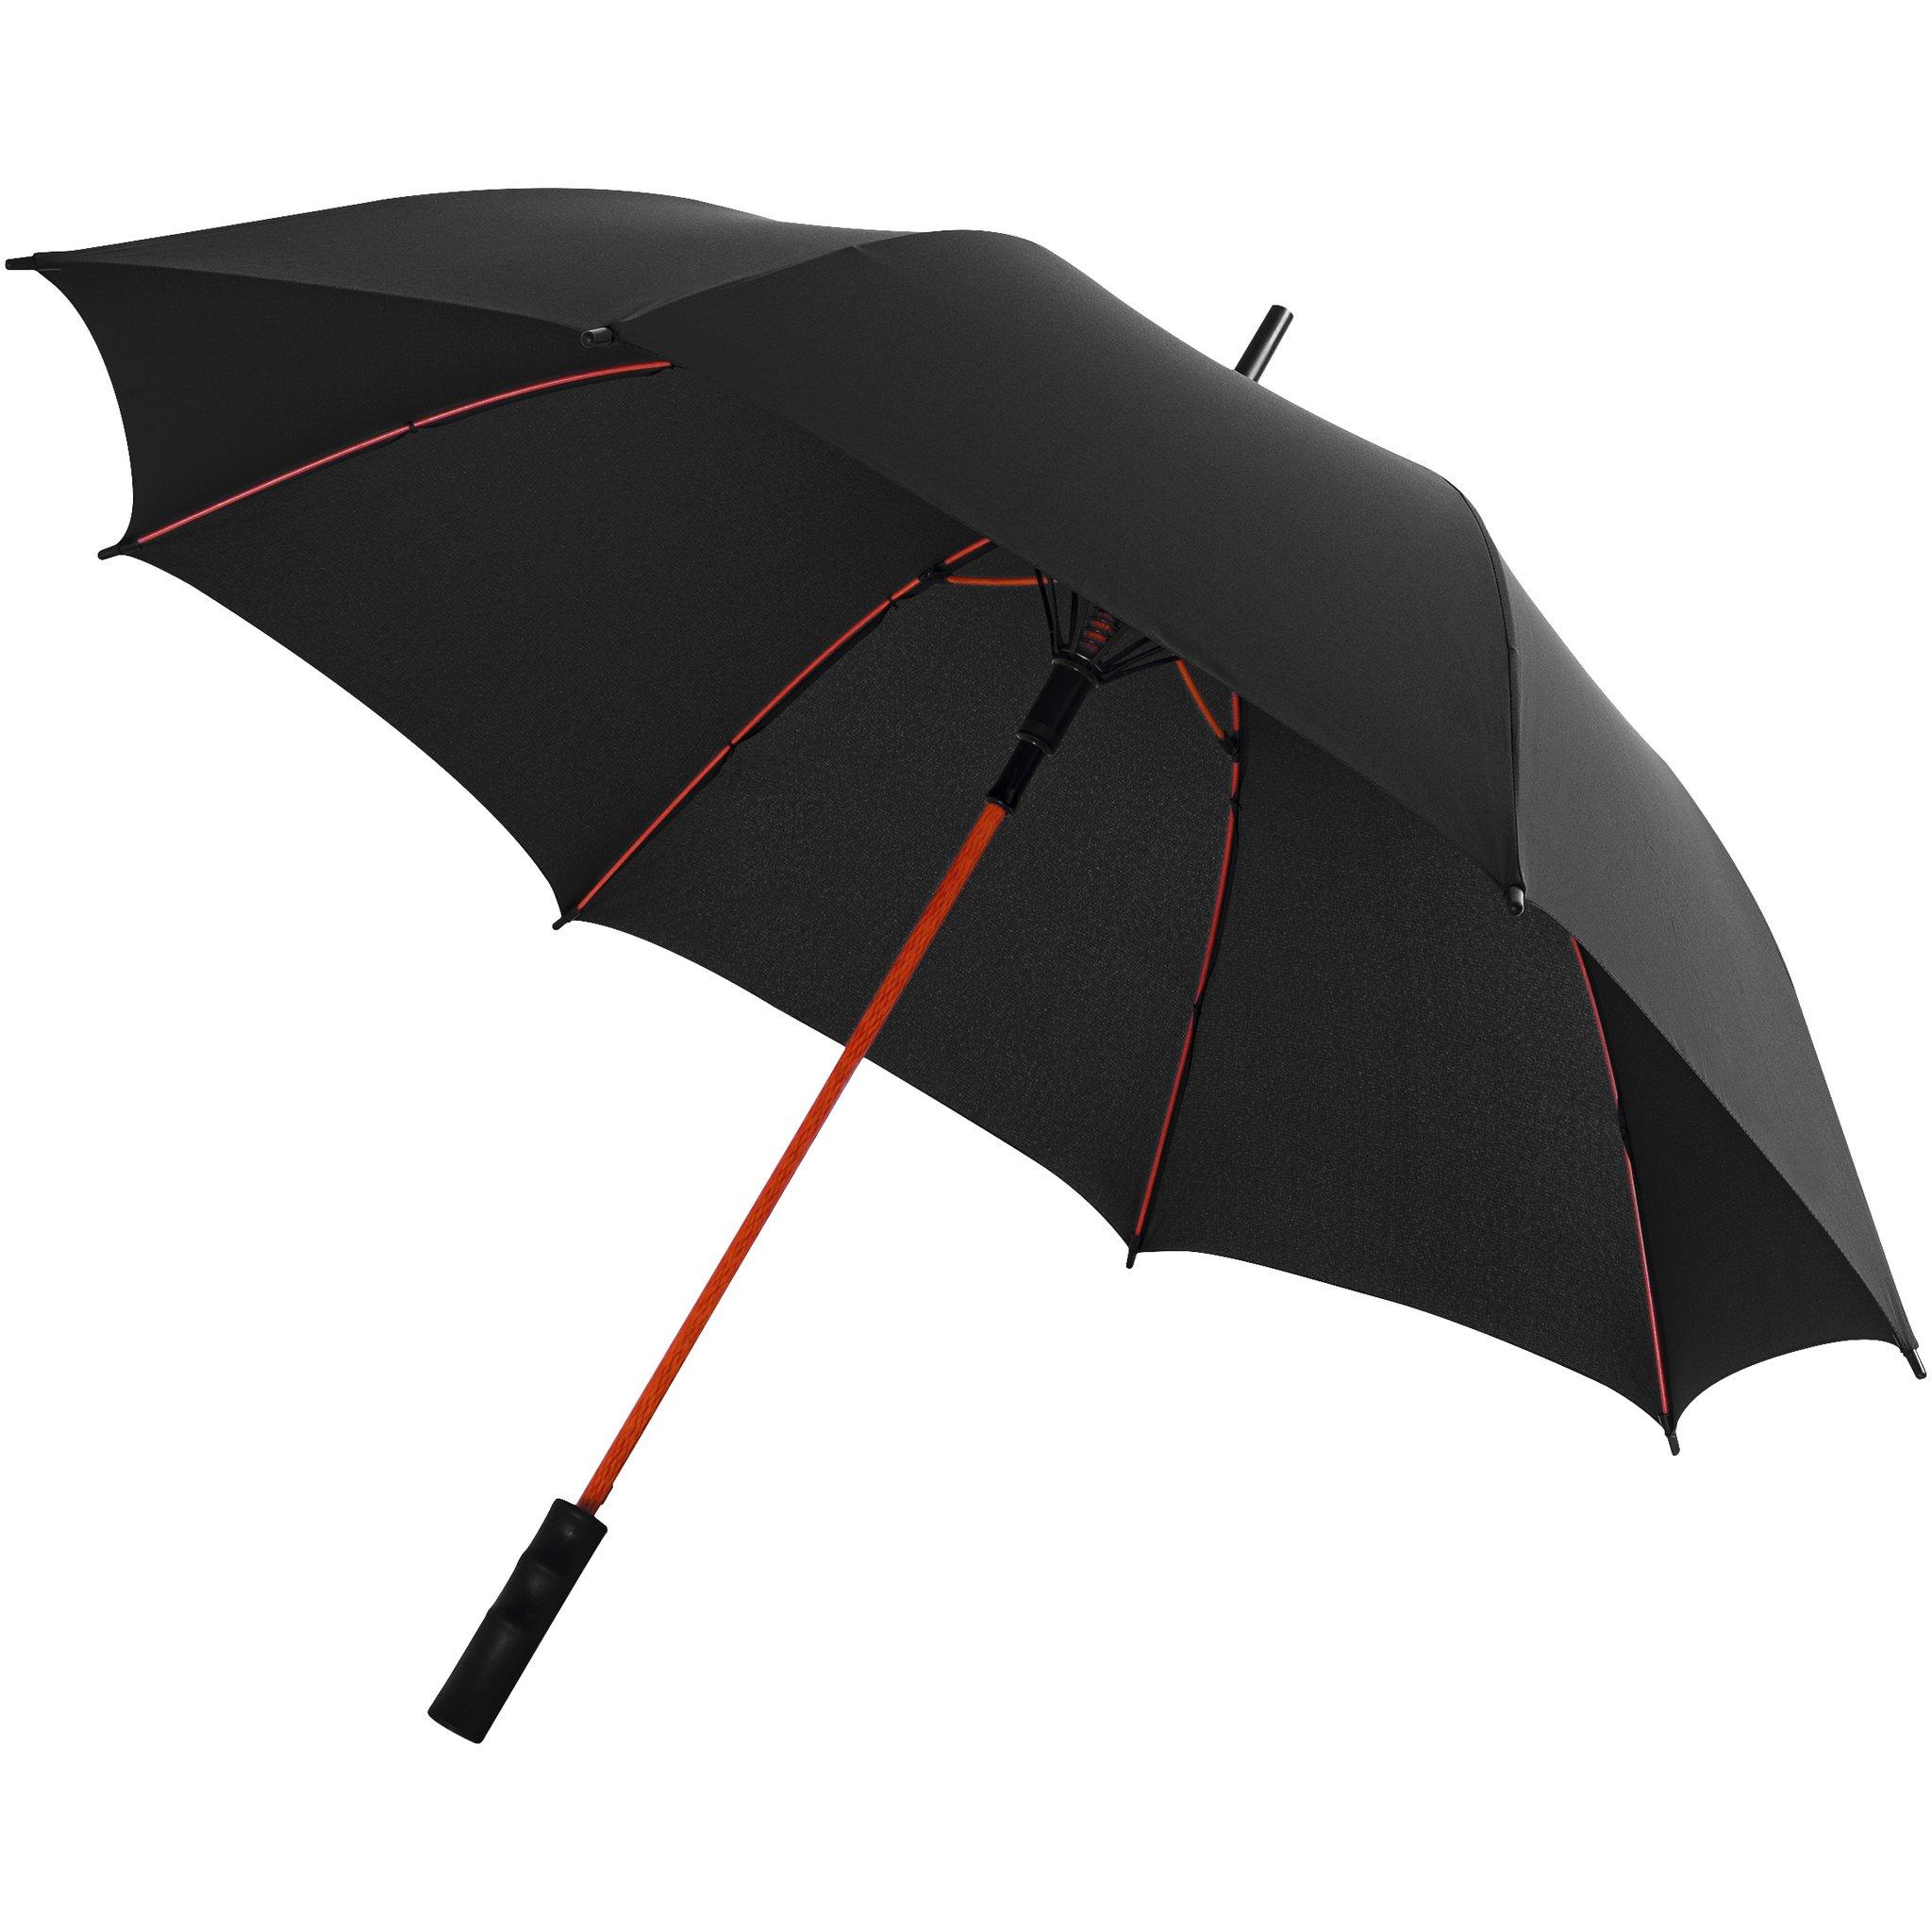 "Avenue Spark 23"" storm-proof automatic umbrella"